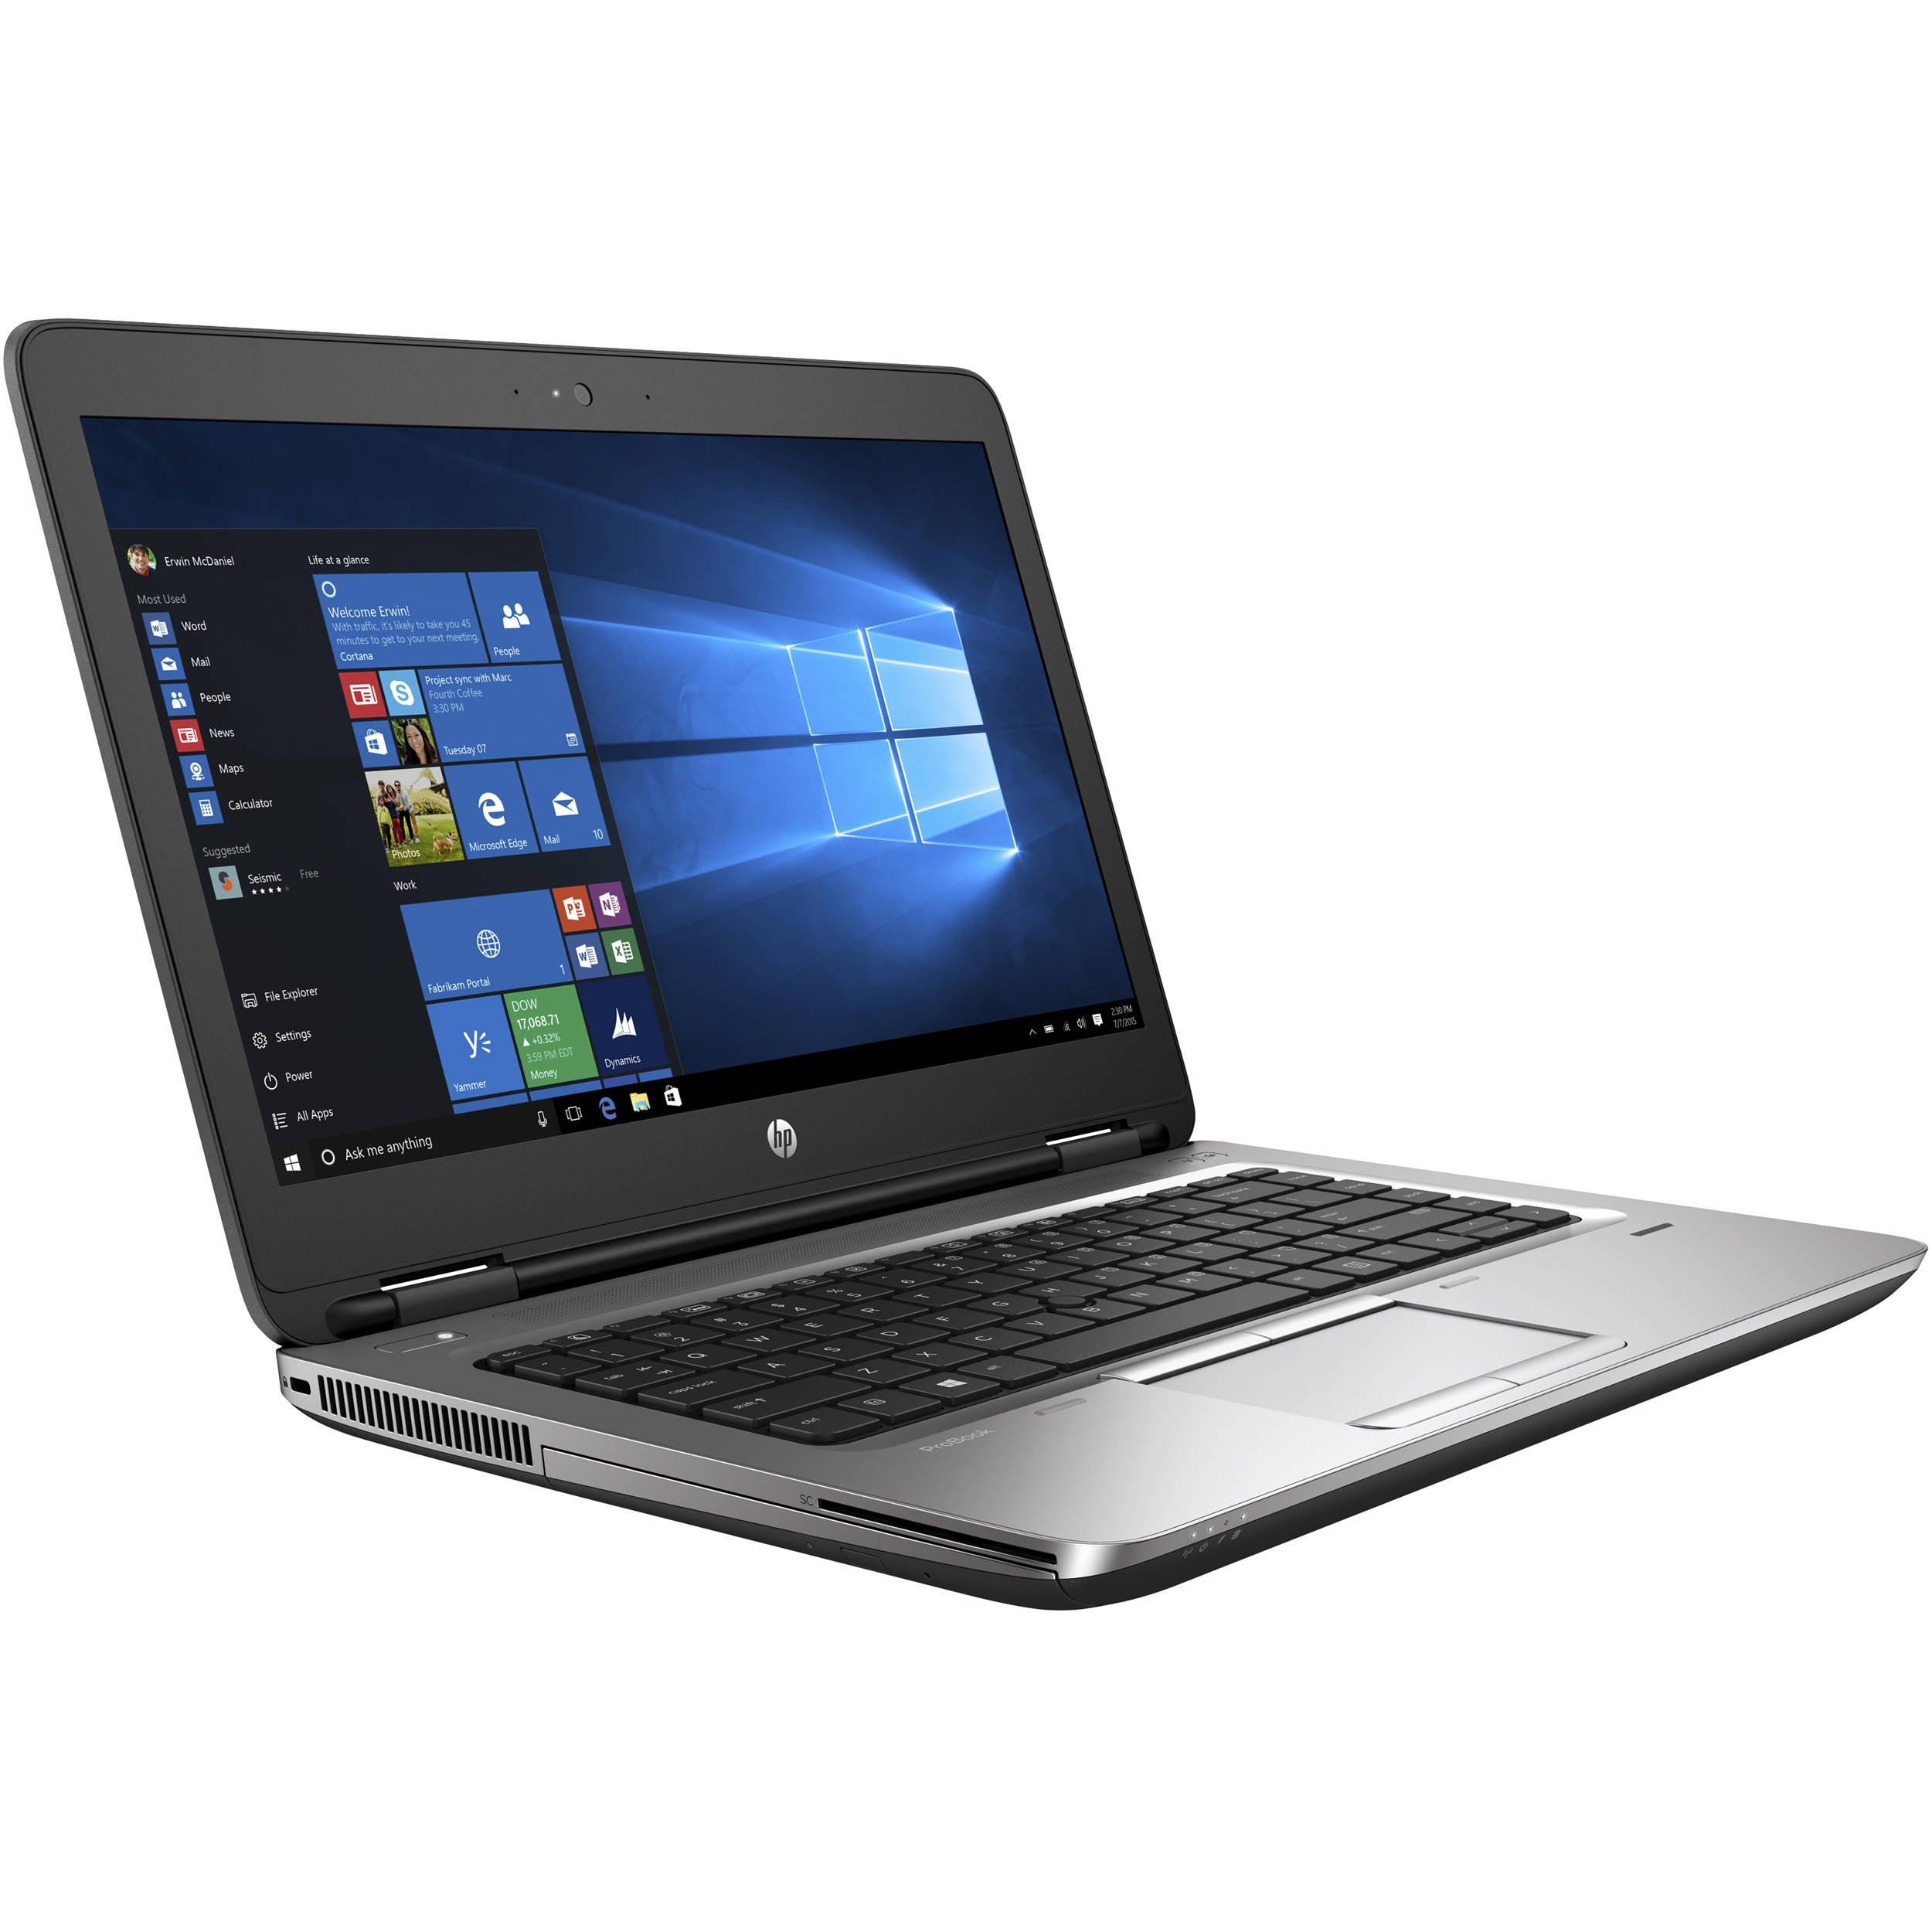 HP ProBook 650 G3 Business Laptop: 15.6'' (1366x768), Intel Core i7-7600U, 256GB NVMe SSD, 16GB DDR4, DVD-RW, Backlit Keyboard, Windows 10 Professional